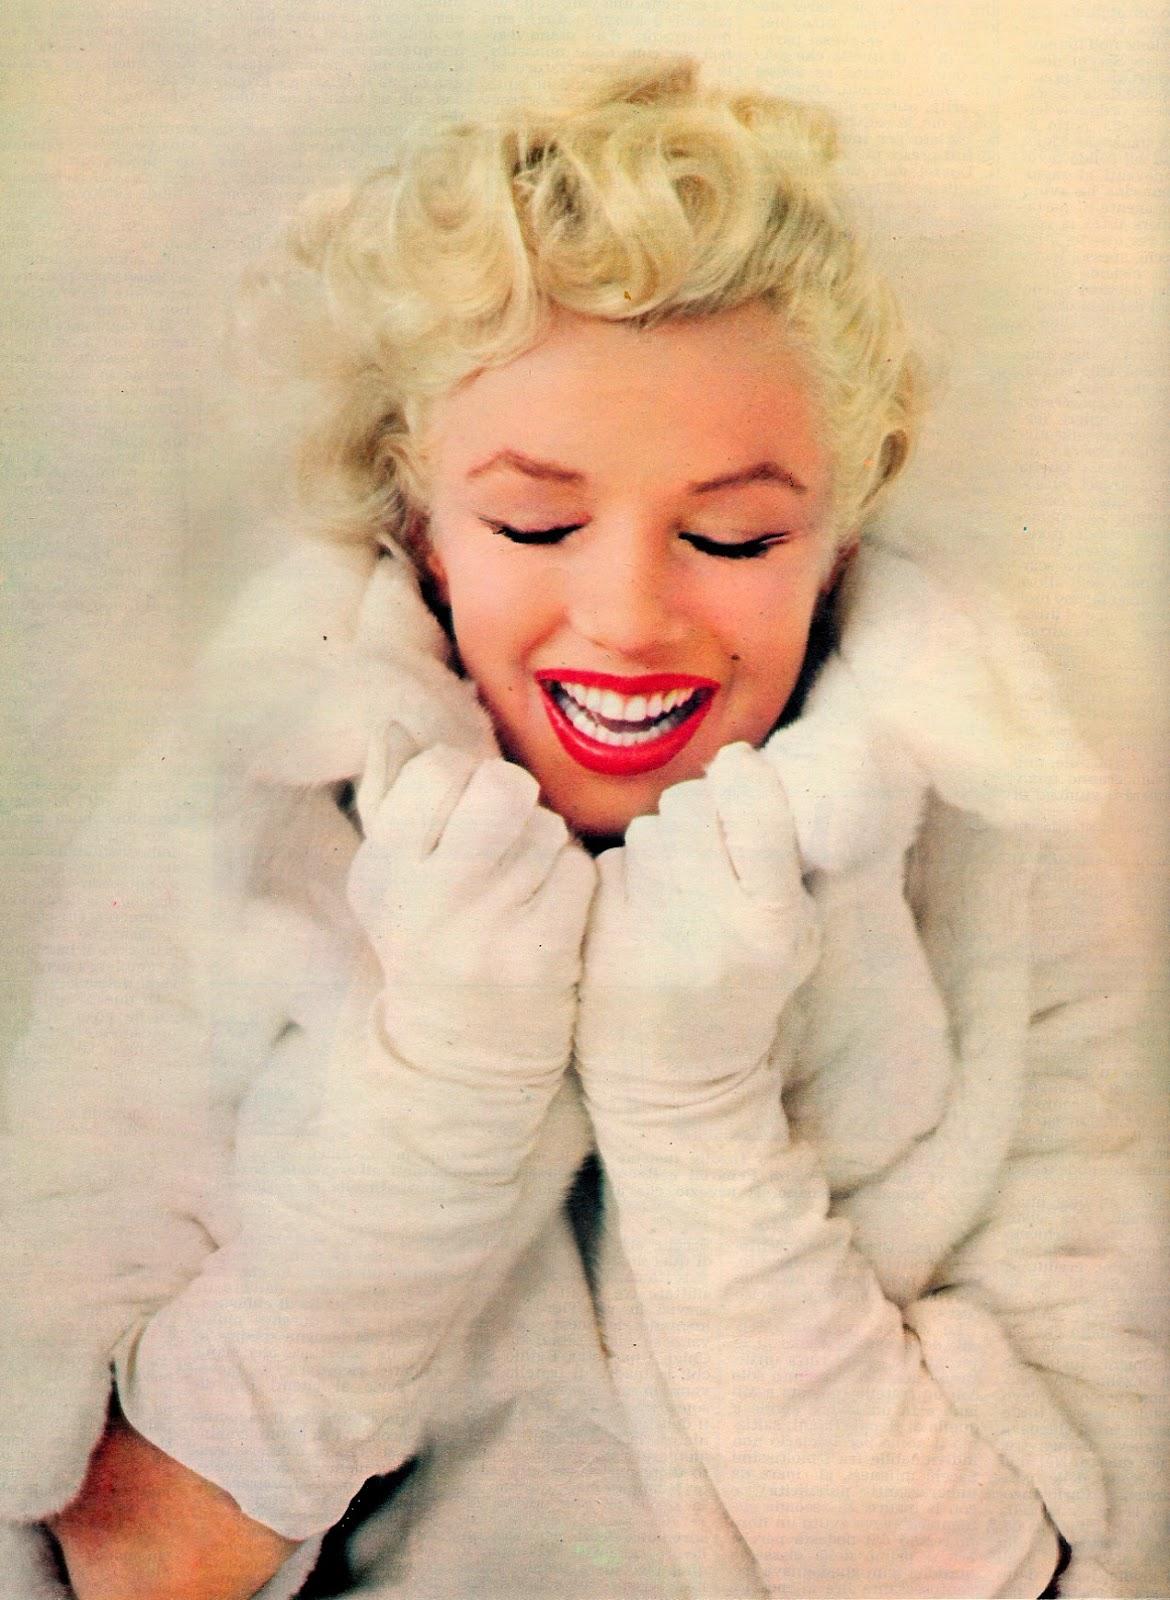 http://4.bp.blogspot.com/-Z4rOKGnFZok/ULQF49E6s-I/AAAAAAAAIBs/RGXAwNHxic0/s1600/Marilyn+Monroe.jpg